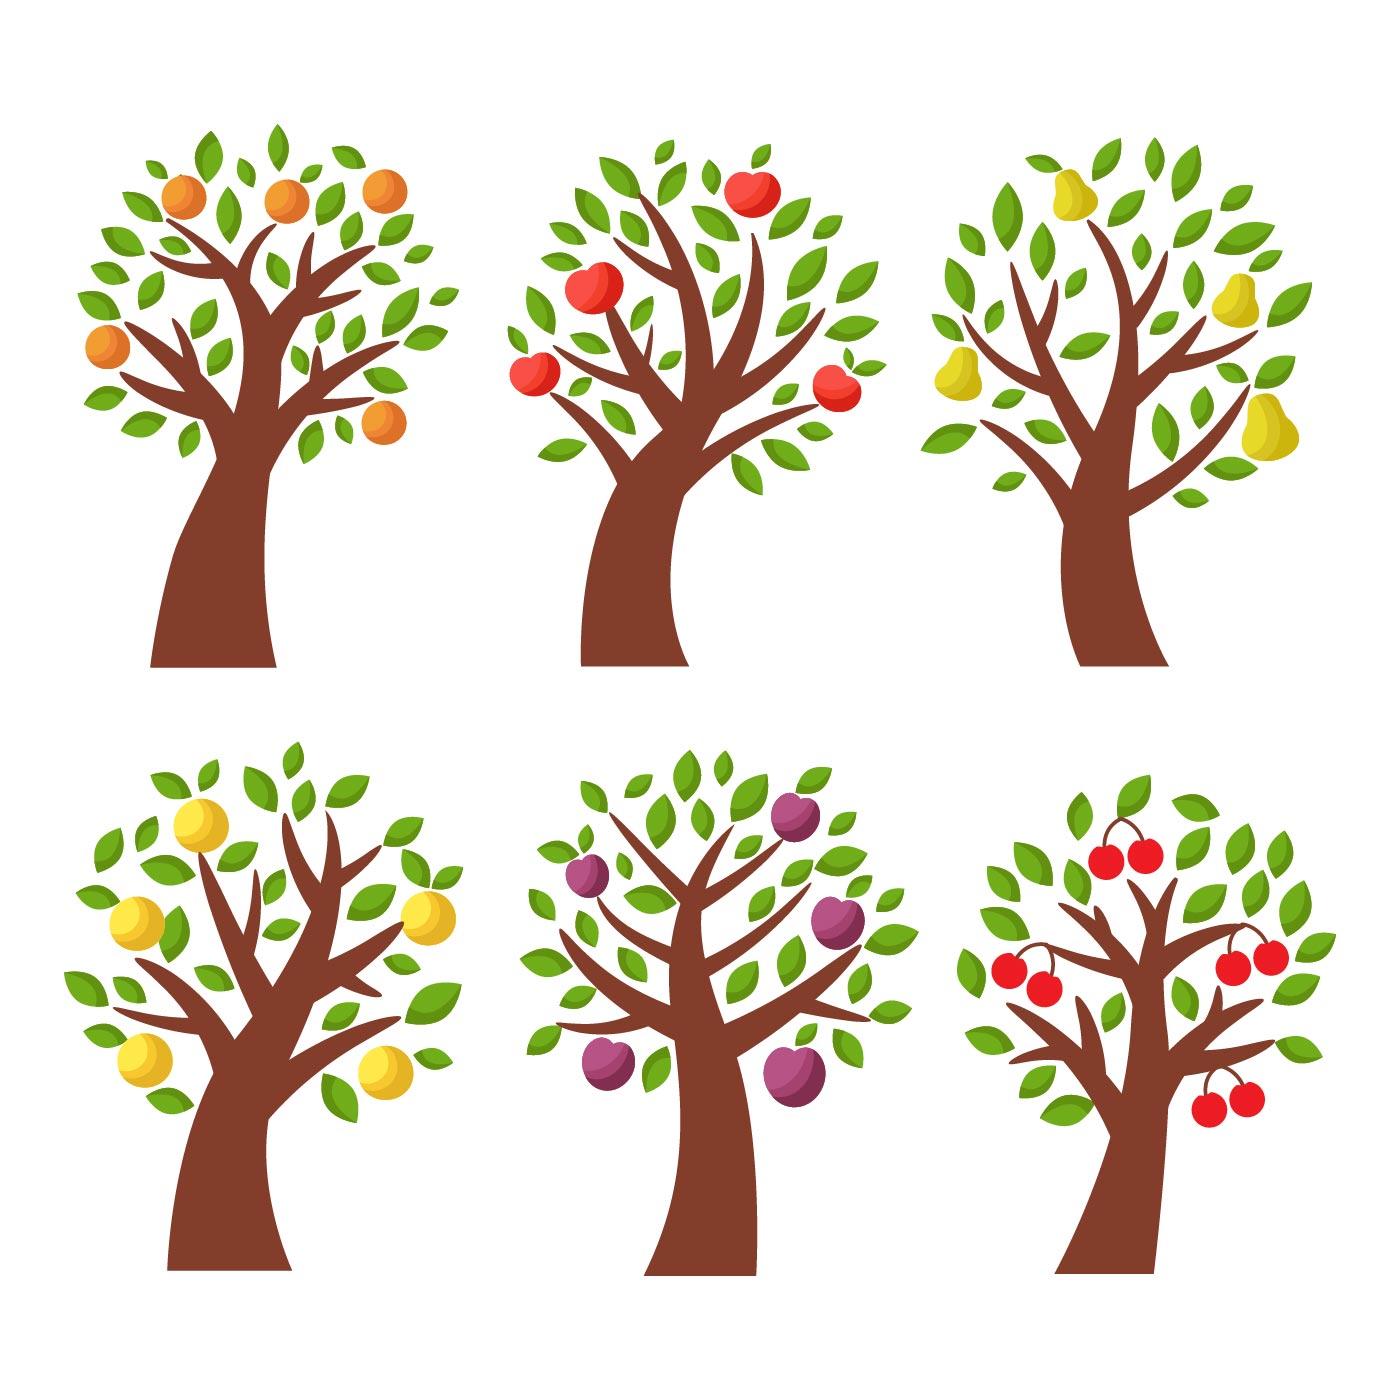 Peach free vector art 5748 free downloads for Peach tree designs